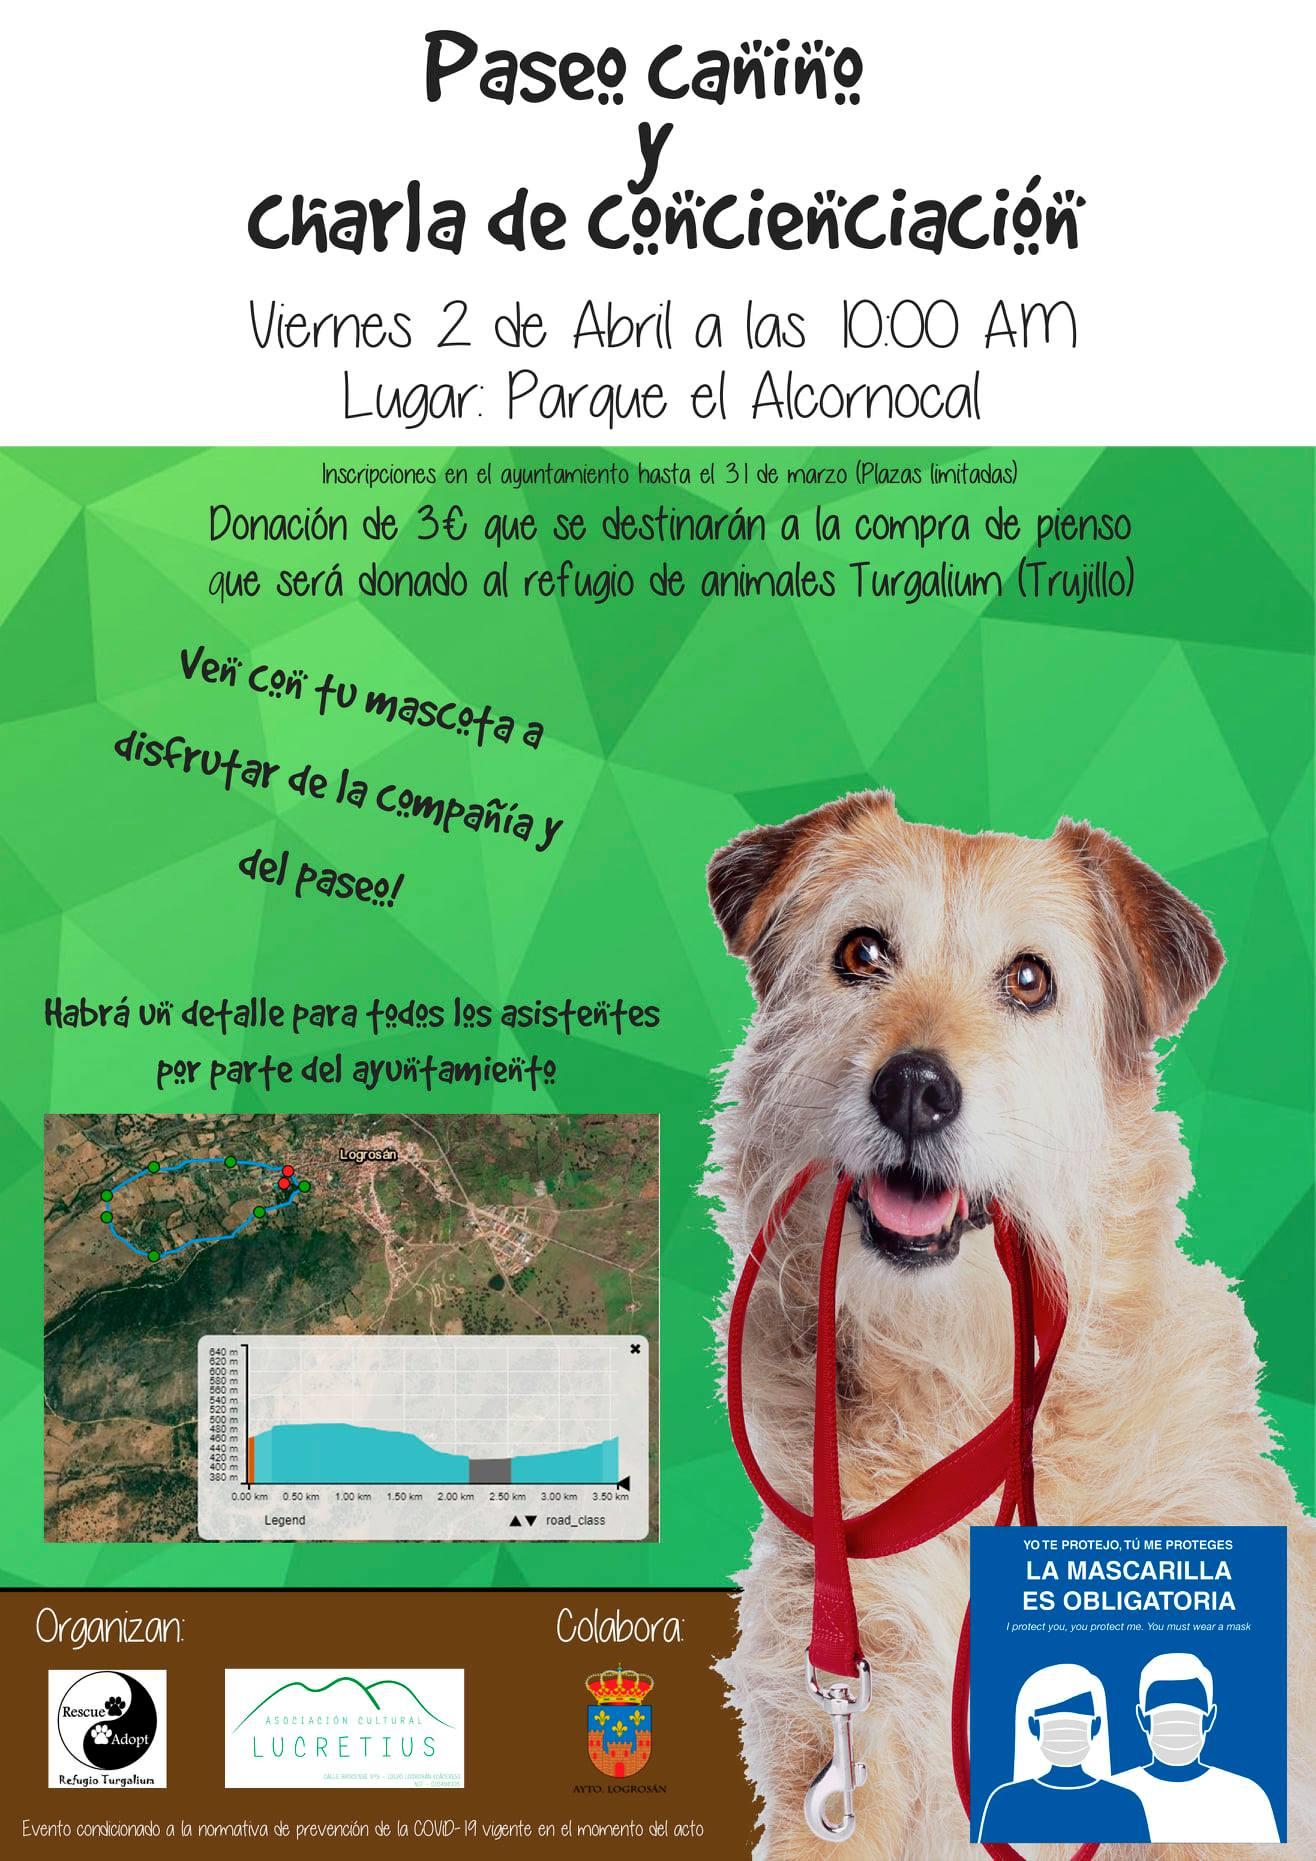 Paseo canino y charla de concienciación (2021) - Logrosán (Cáceres)